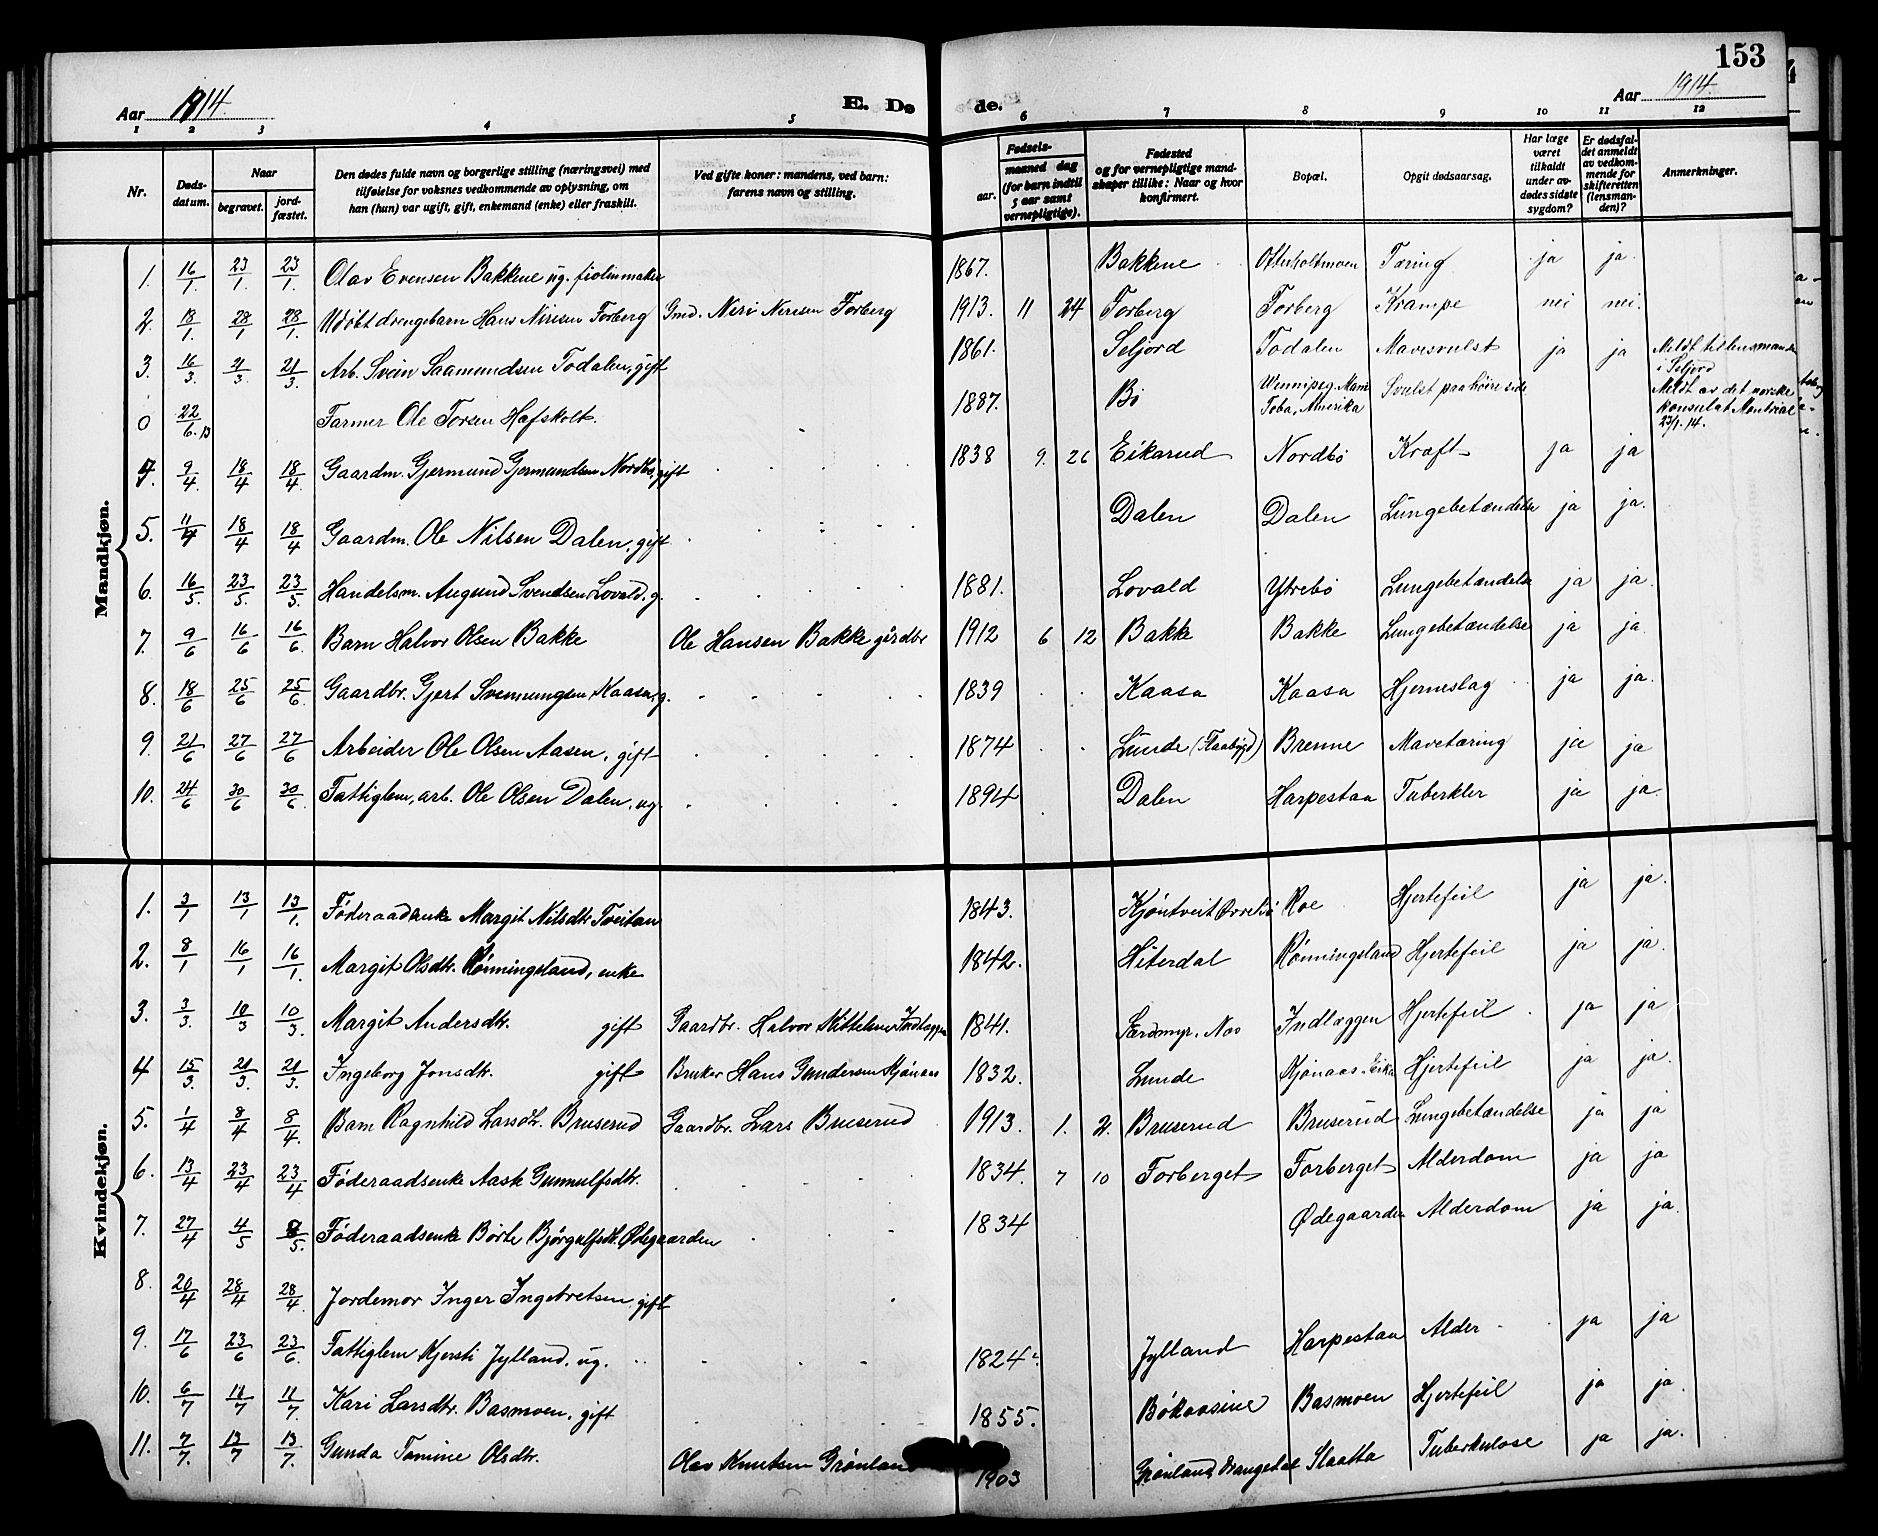 SAKO, Bø kirkebøker, G/Ga/L0007: Klokkerbok nr. 7, 1909-1924, s. 153